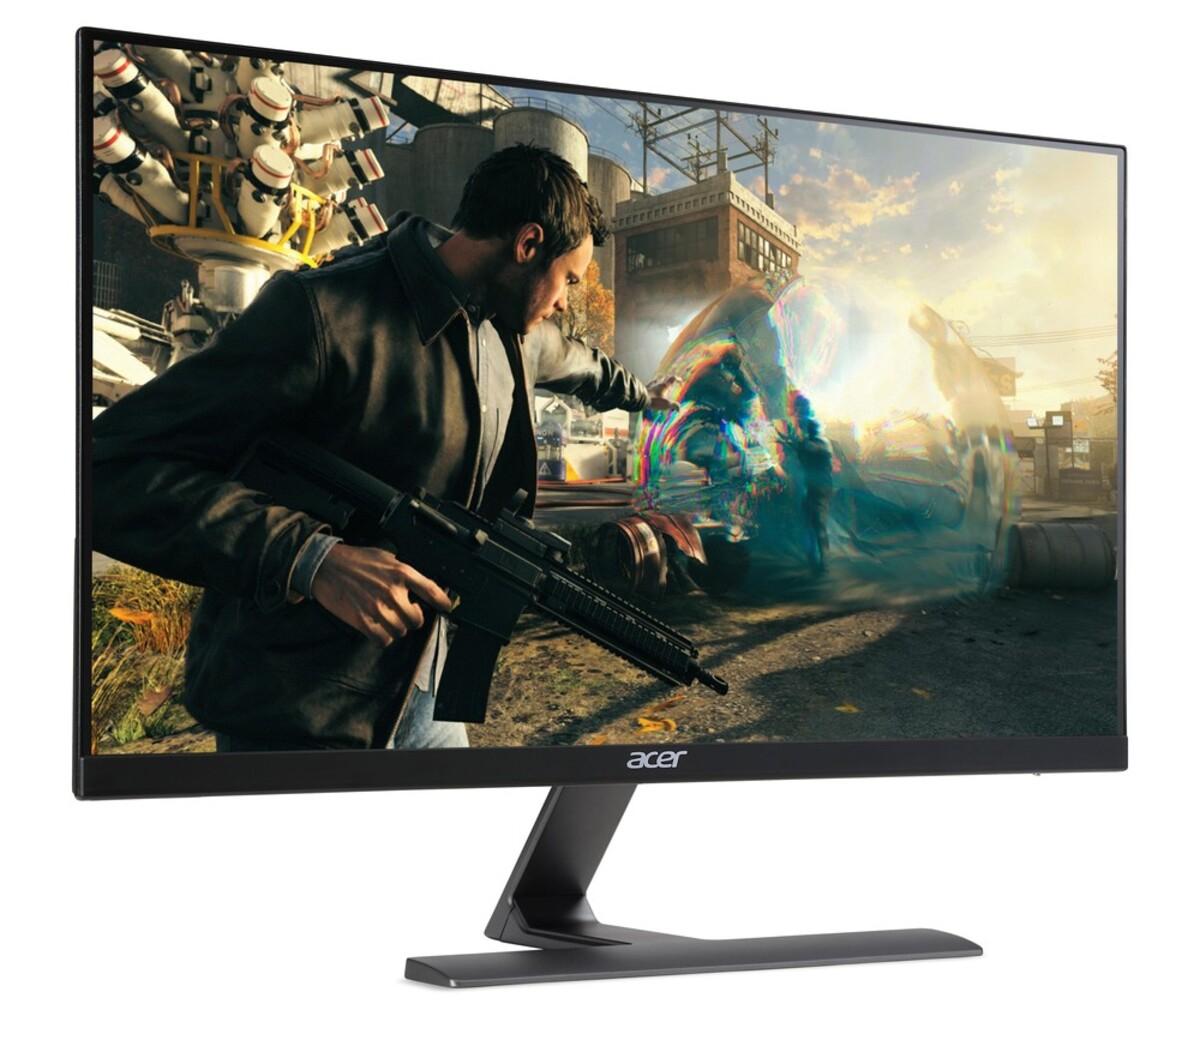 Bild 5 von ACER Nitro RG270bmiix Gaming-Monitor (D, 27 Zoll, Full-HD 1920 x 1080 Pixel, IPS, 1 ms Reaktionszeit, 75 HZ, 2x HDMI, VGA, Zero Frame, FreeSync, Lautsprecher)